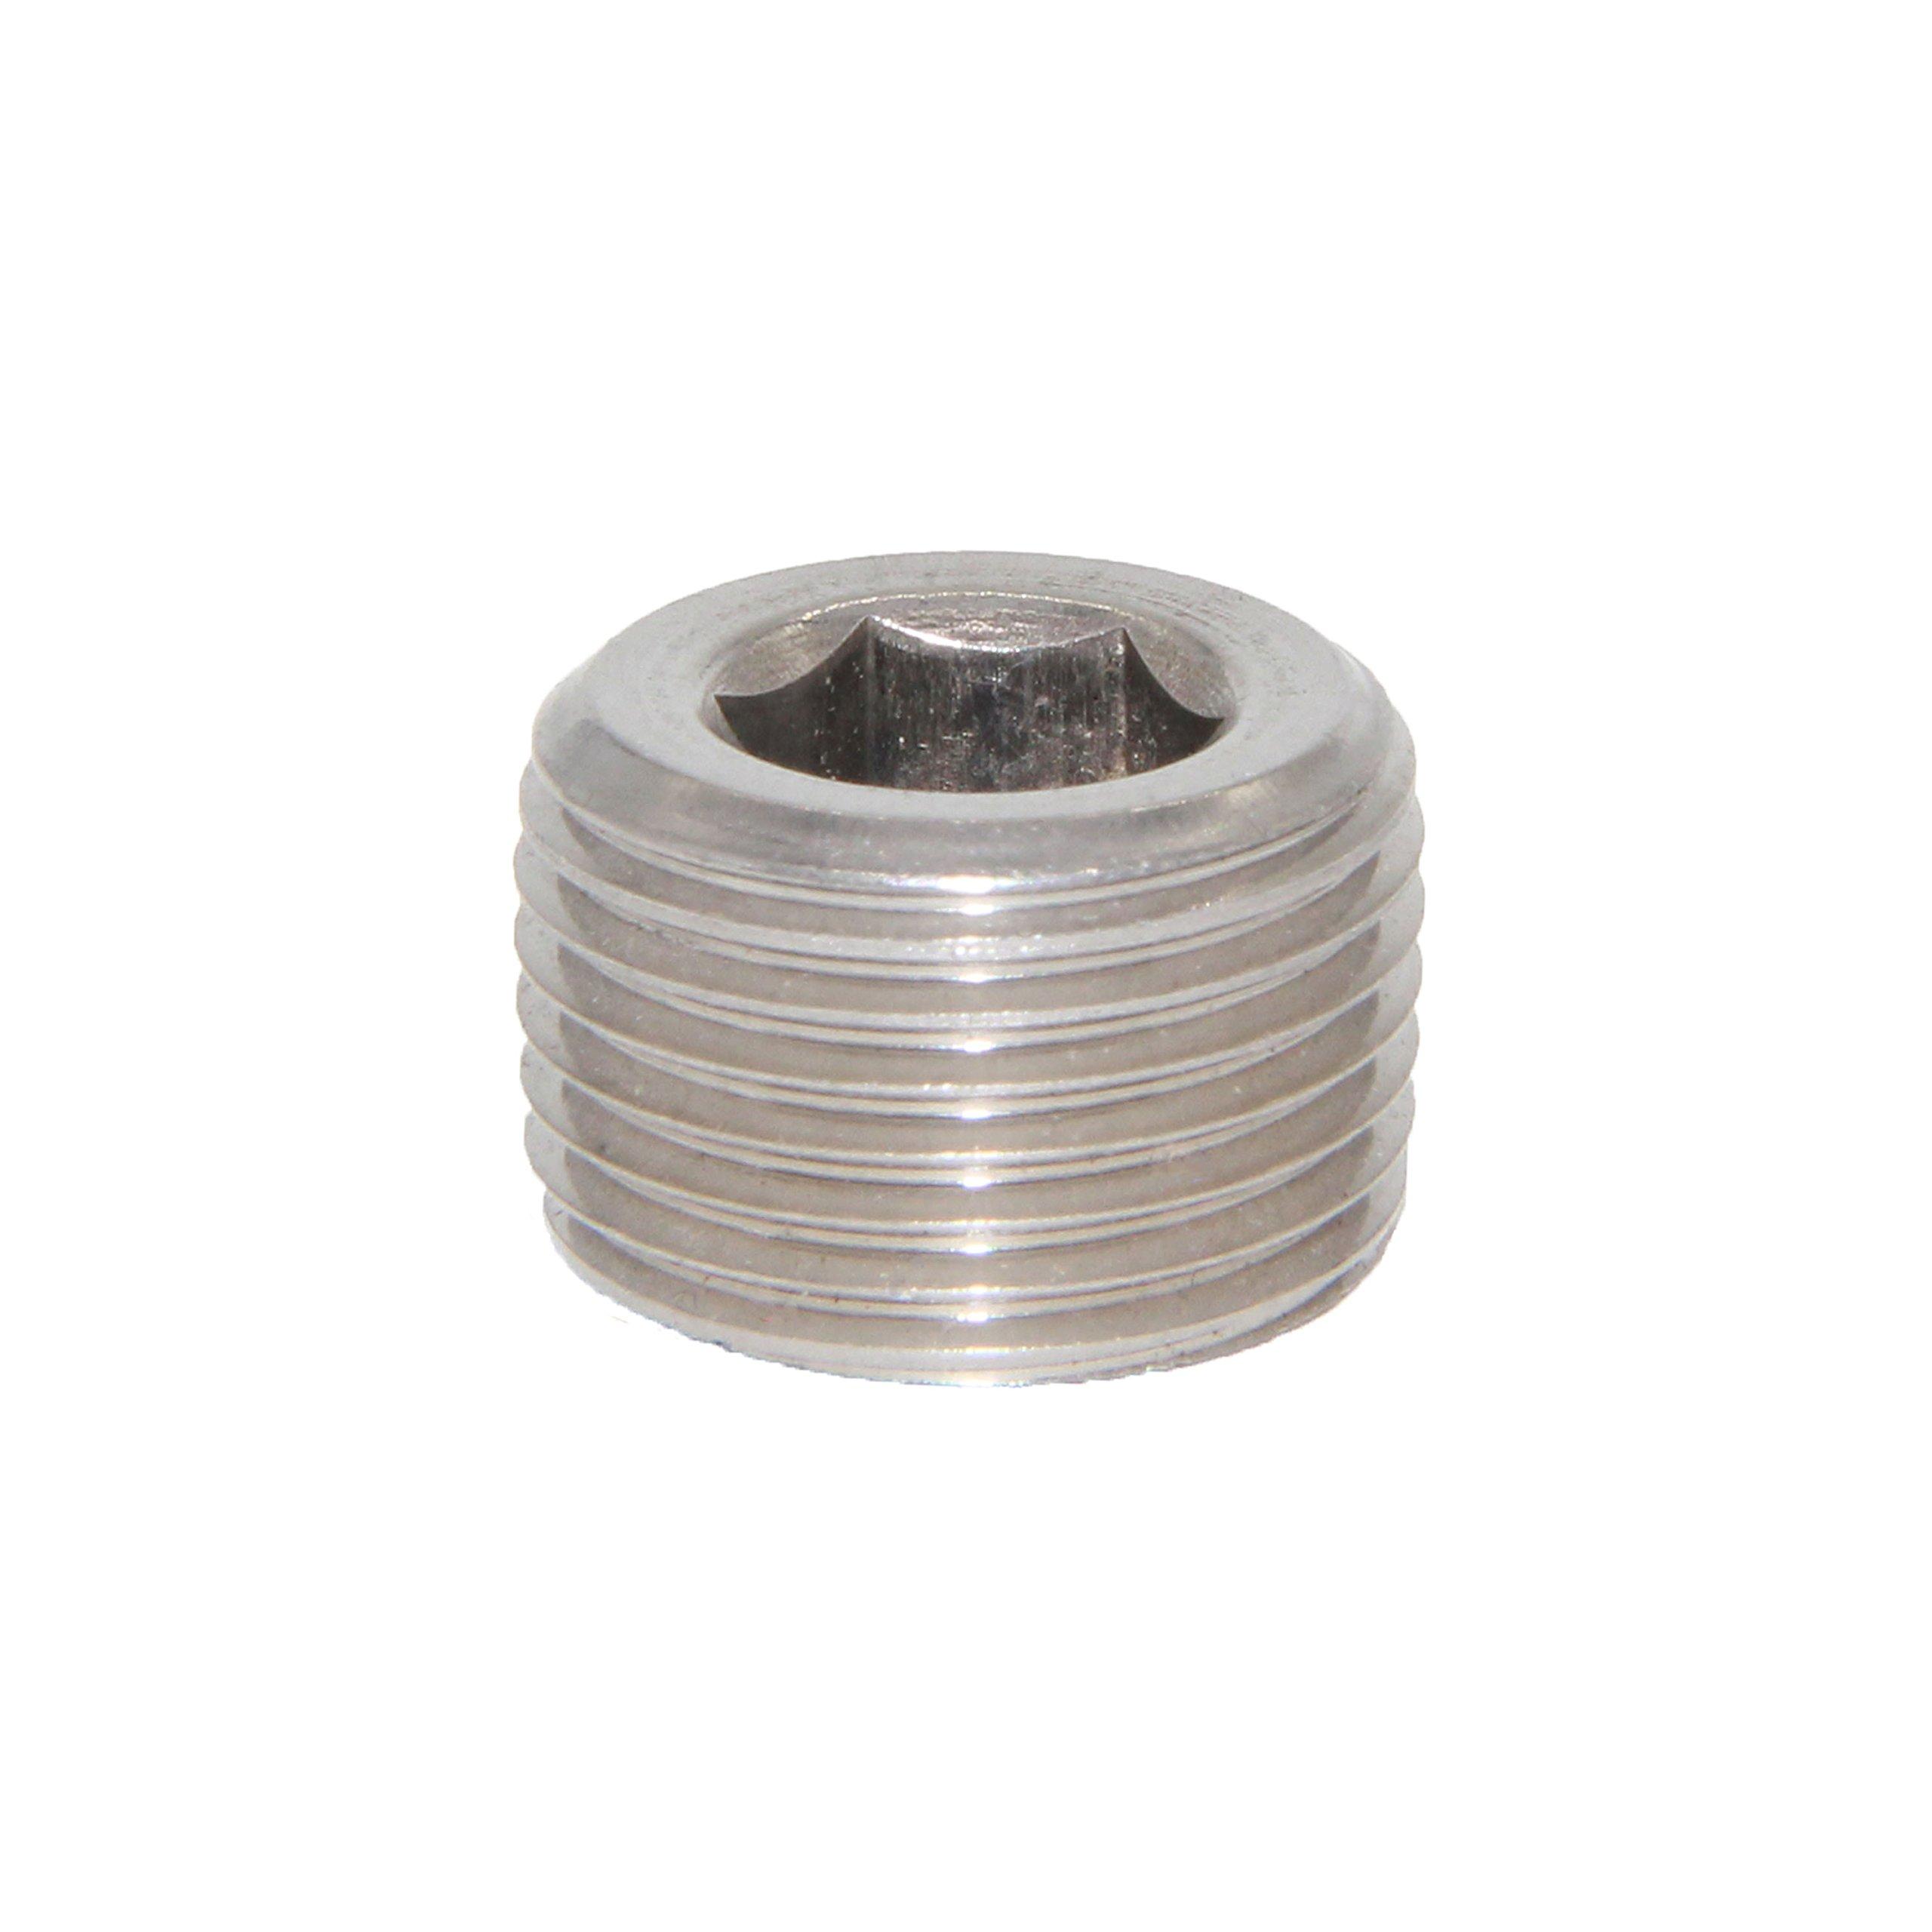 Joyway Stainless Steel Internal Hex Countersunk Thread Socket Pipe Plug 3/4'' NPT Male